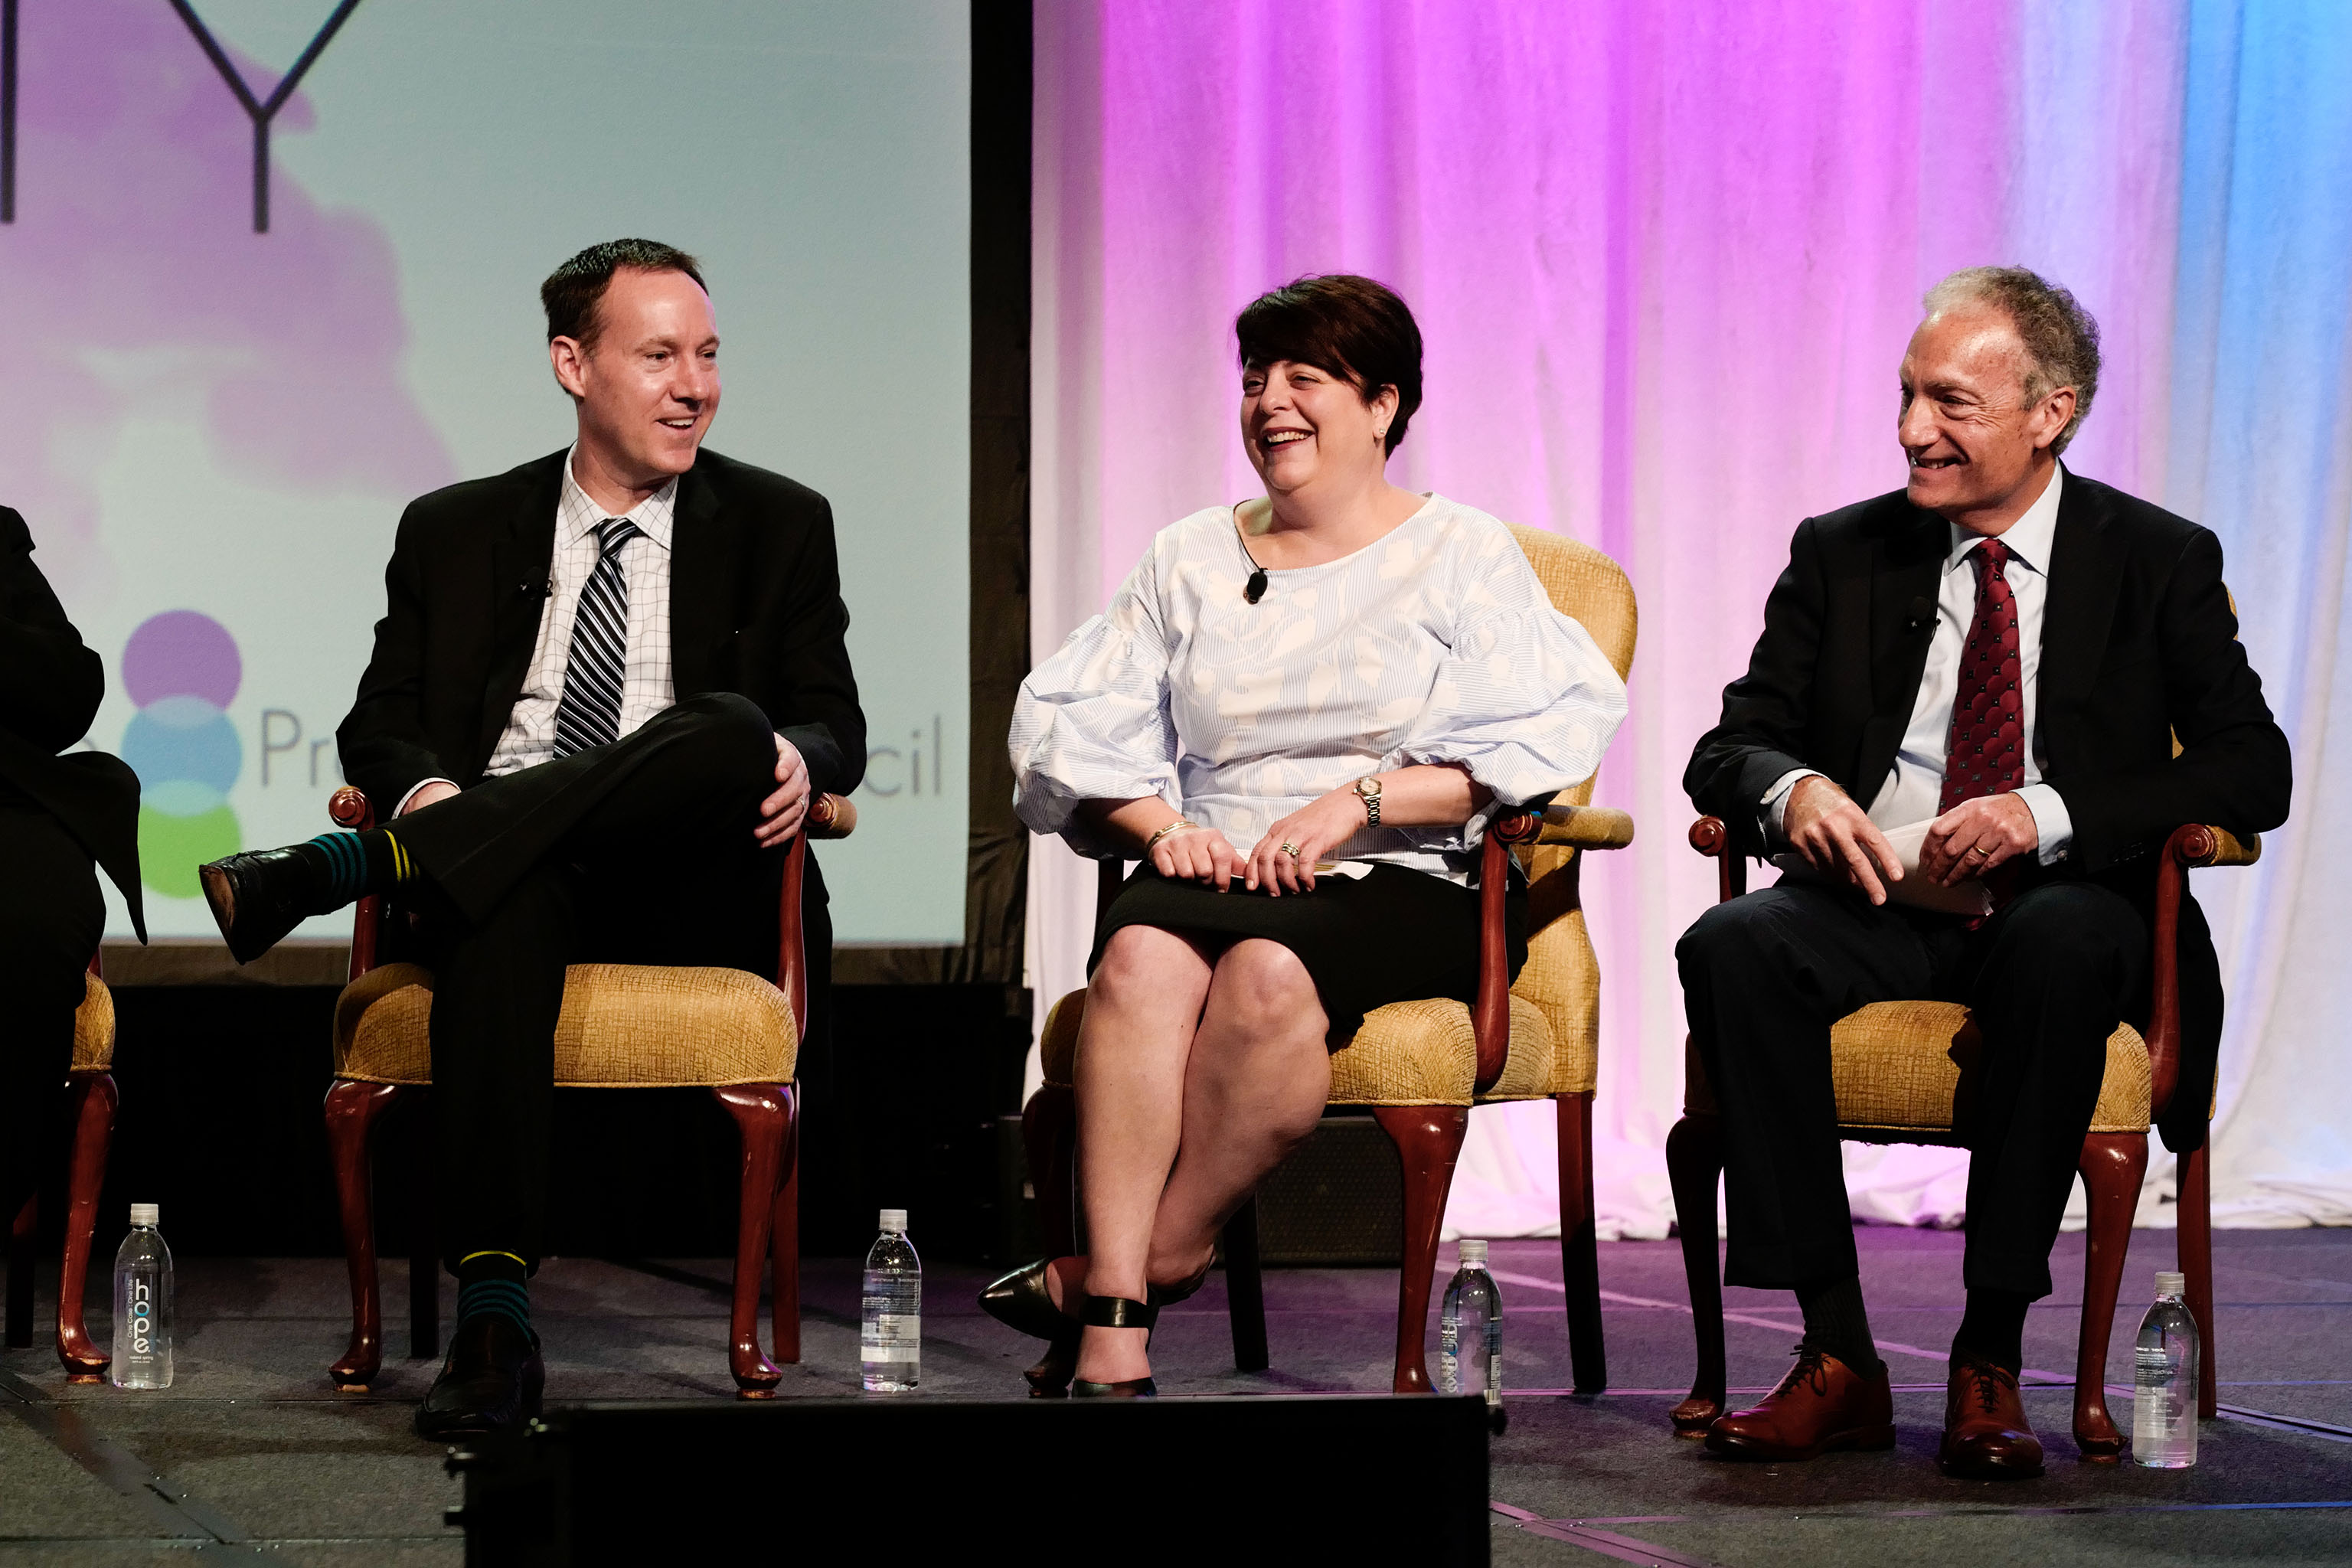 Tom Myers, Lisa Powers, and Mark Pollak